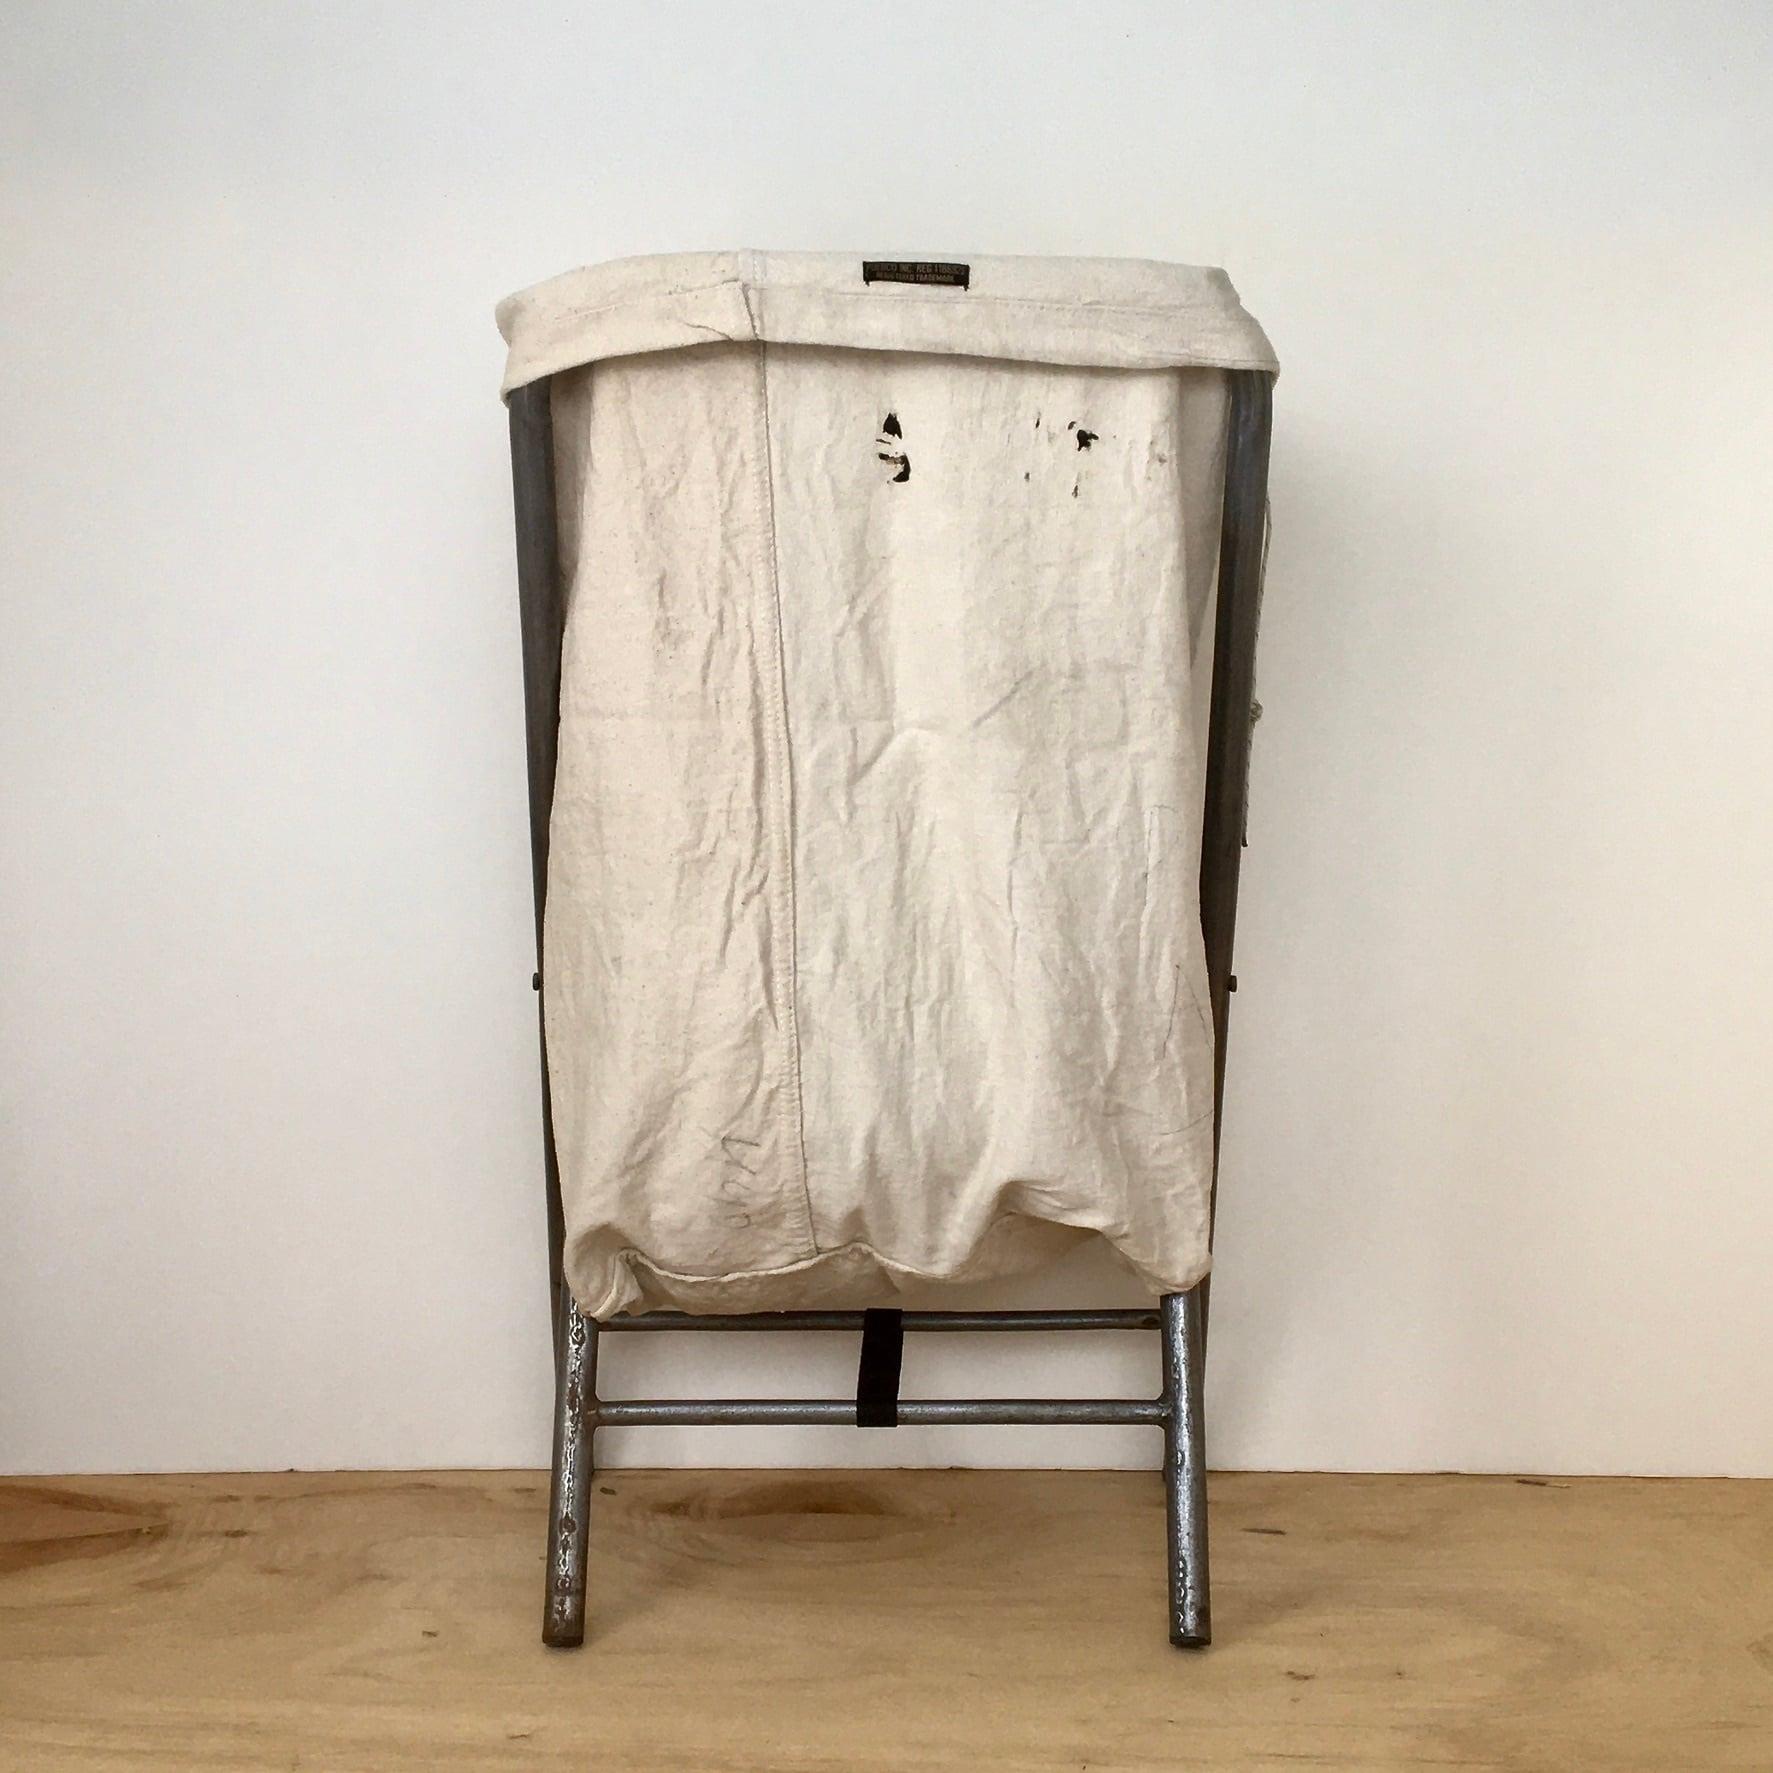 Vintage Folding Laundry Hamper(PUEBCO) ランドリーバスケット